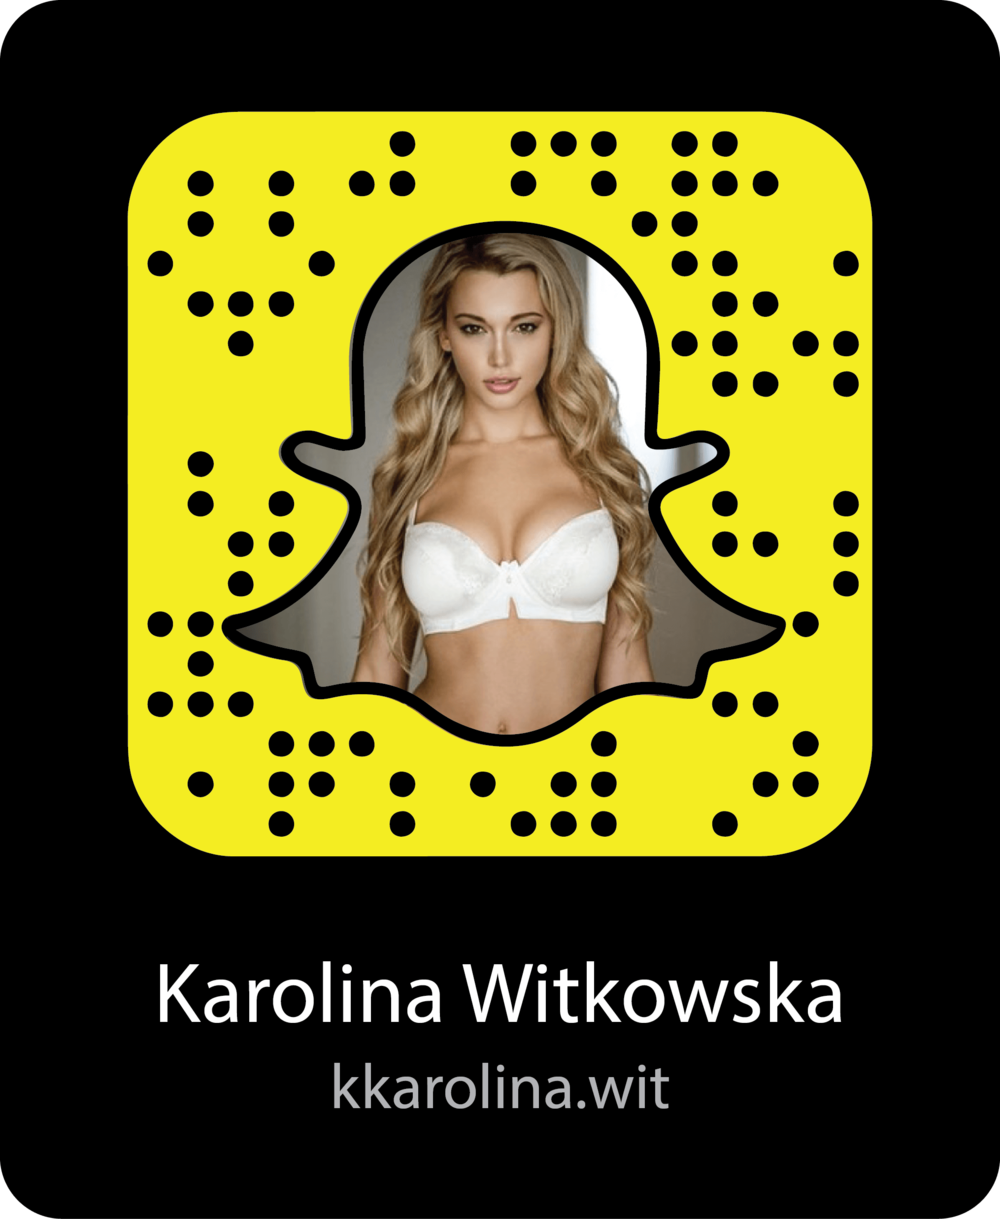 karolina-witkowska-sexy-snapchat-snapcode